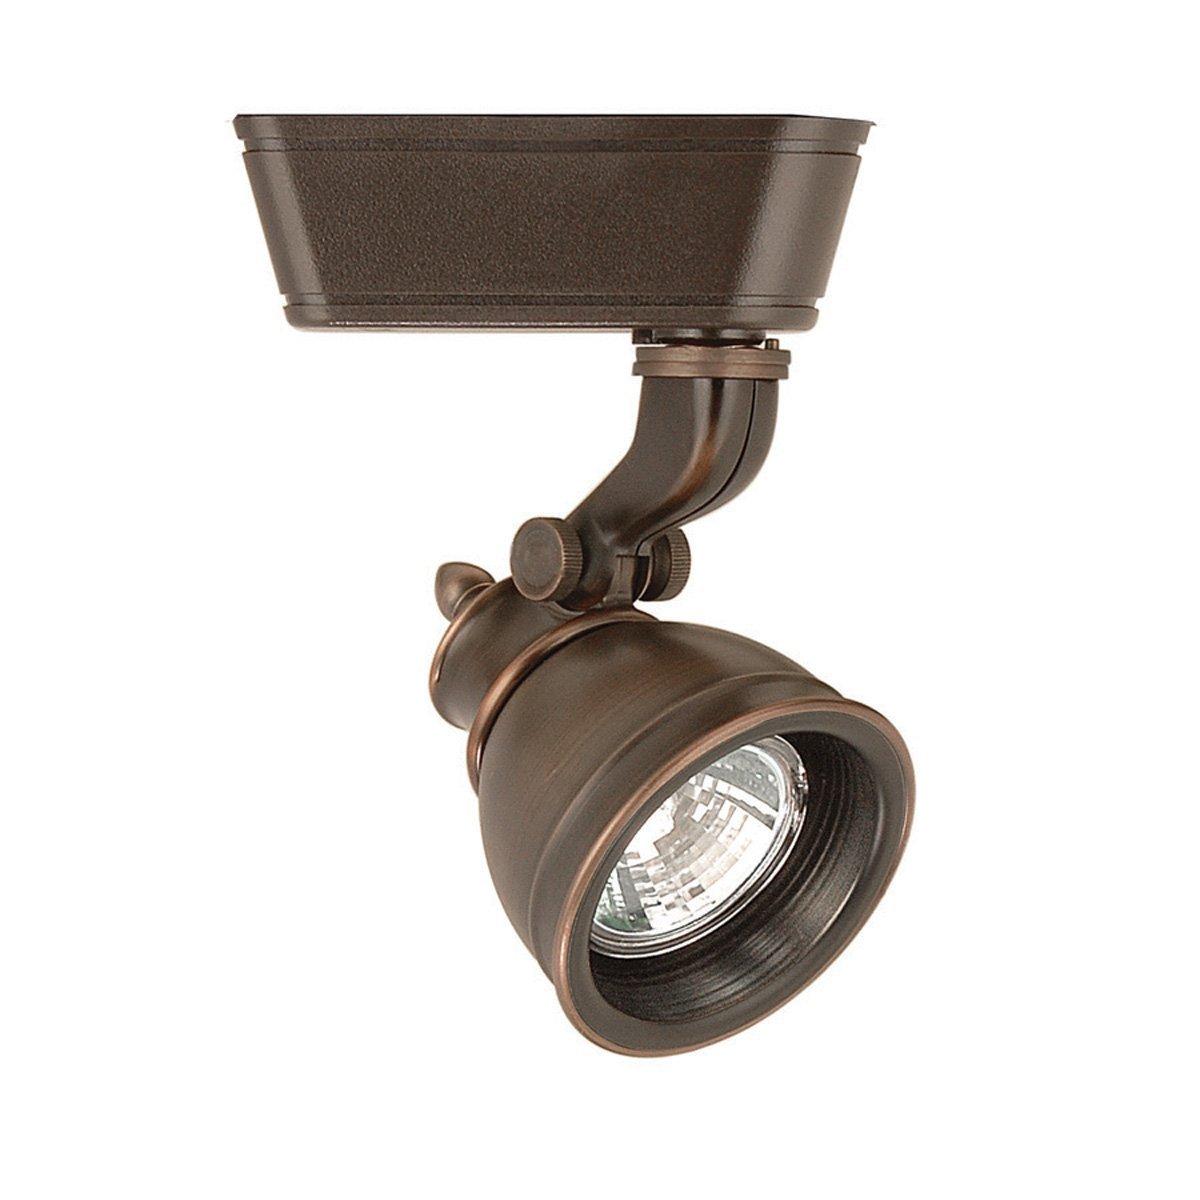 WAC Lighting LHT-874L-AB Caribe Luminaries Track Head, Antique Bronze by WAC Lighting (Image #1)